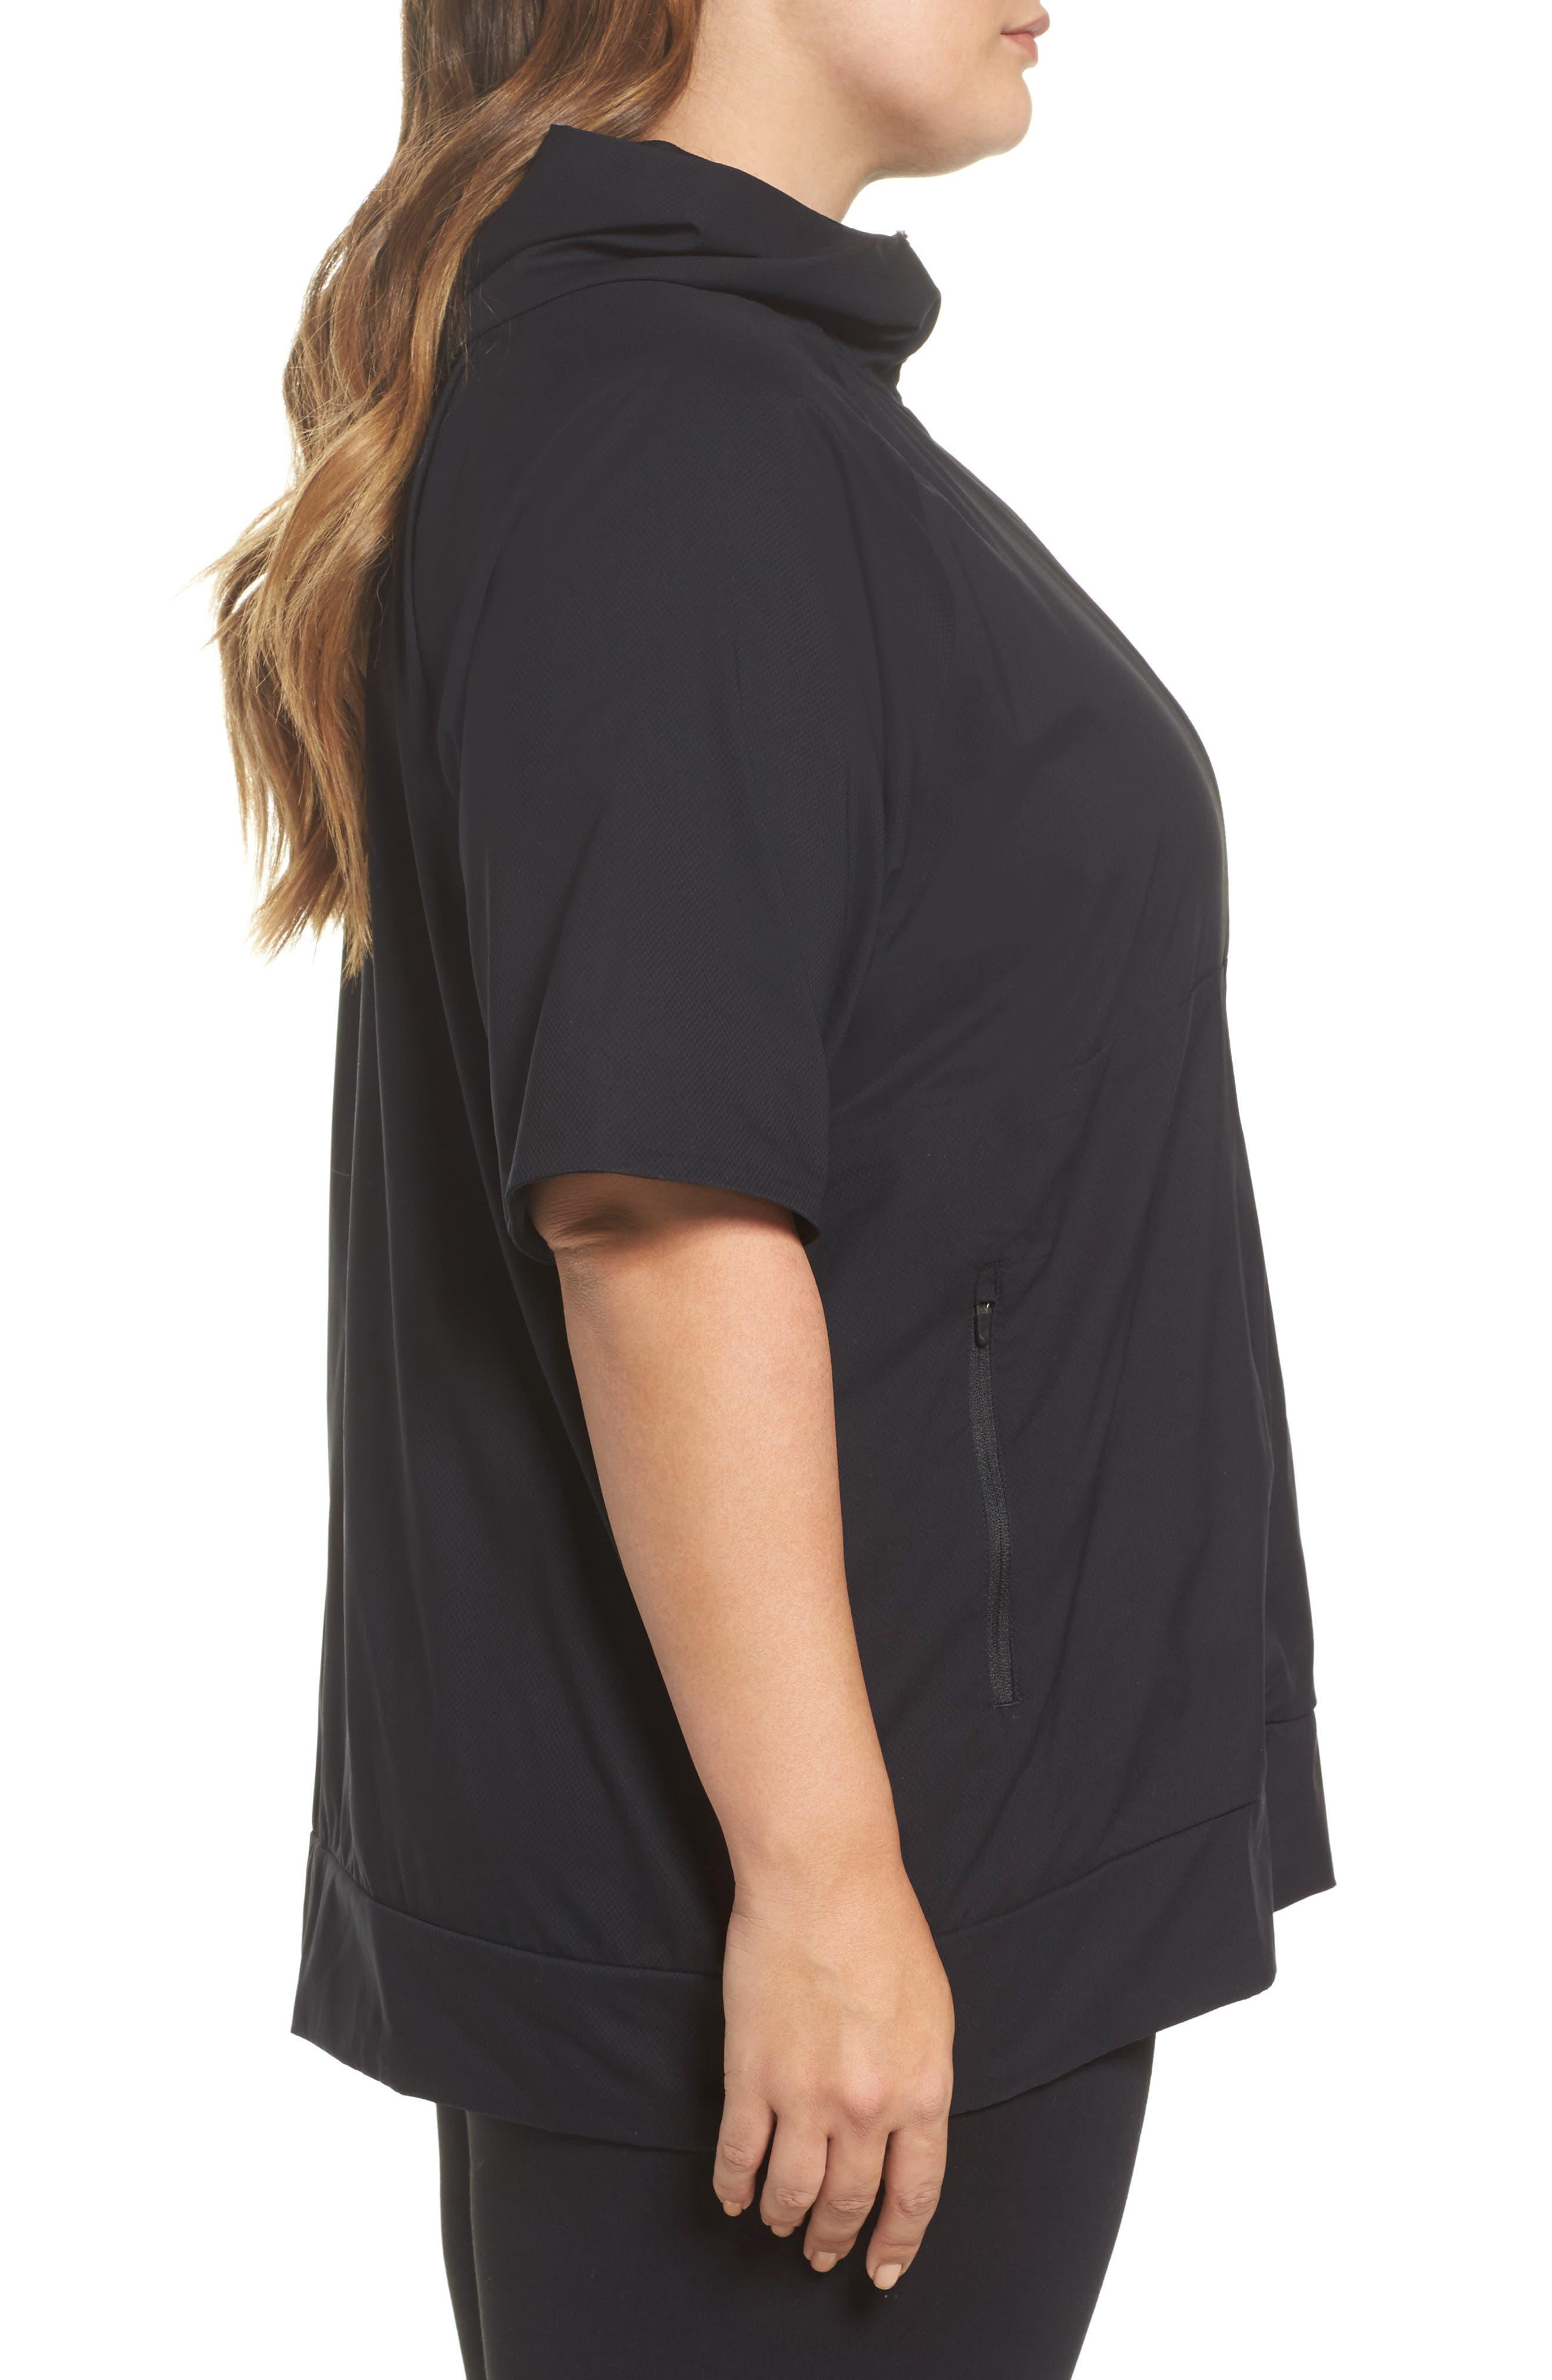 Flex Hooded Running Jacket,                             Alternate thumbnail 3, color,                             Black